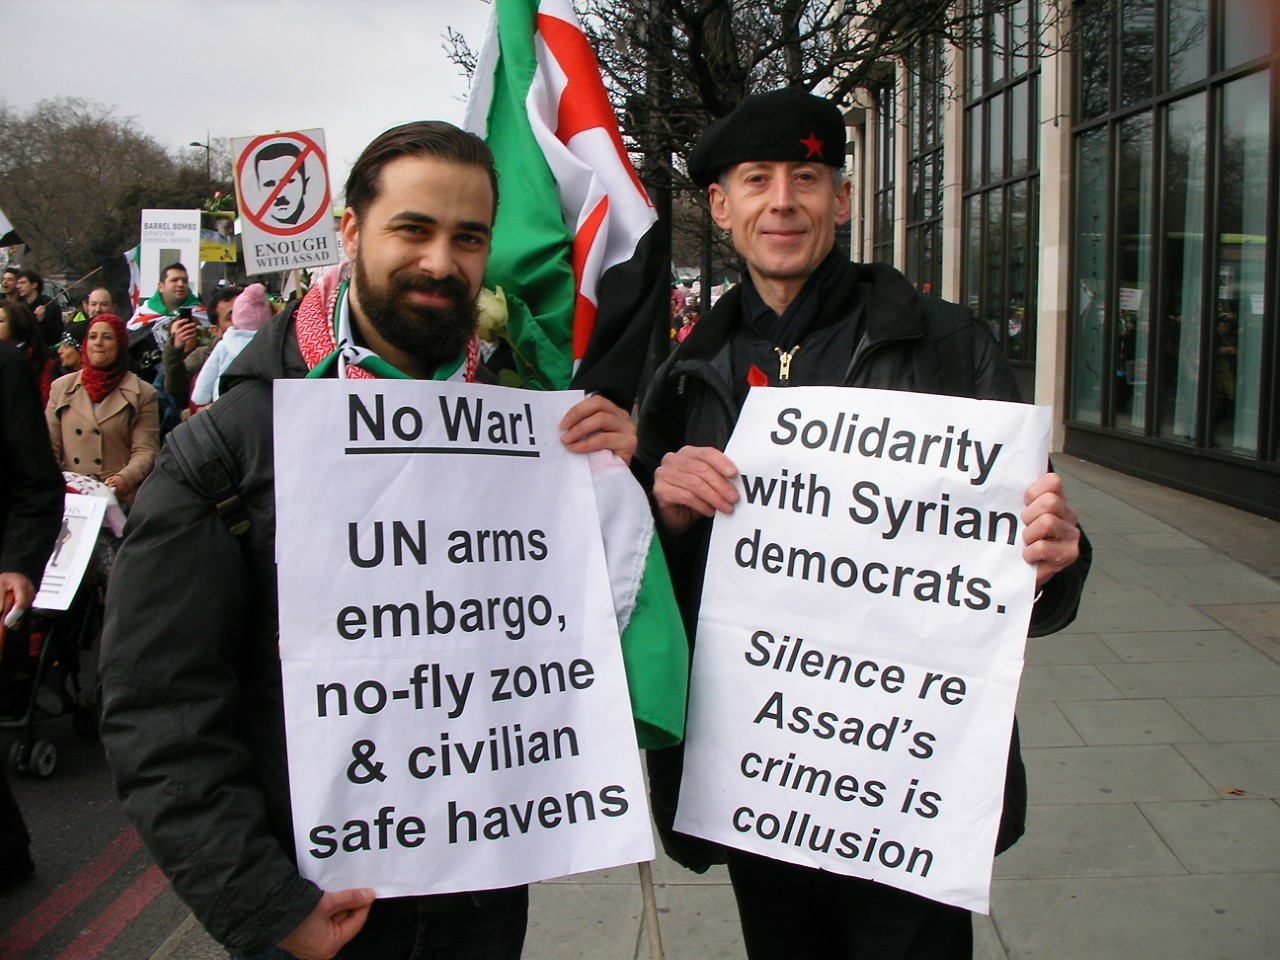 thumbnail_Syria demo 2 - 14 Mar 15